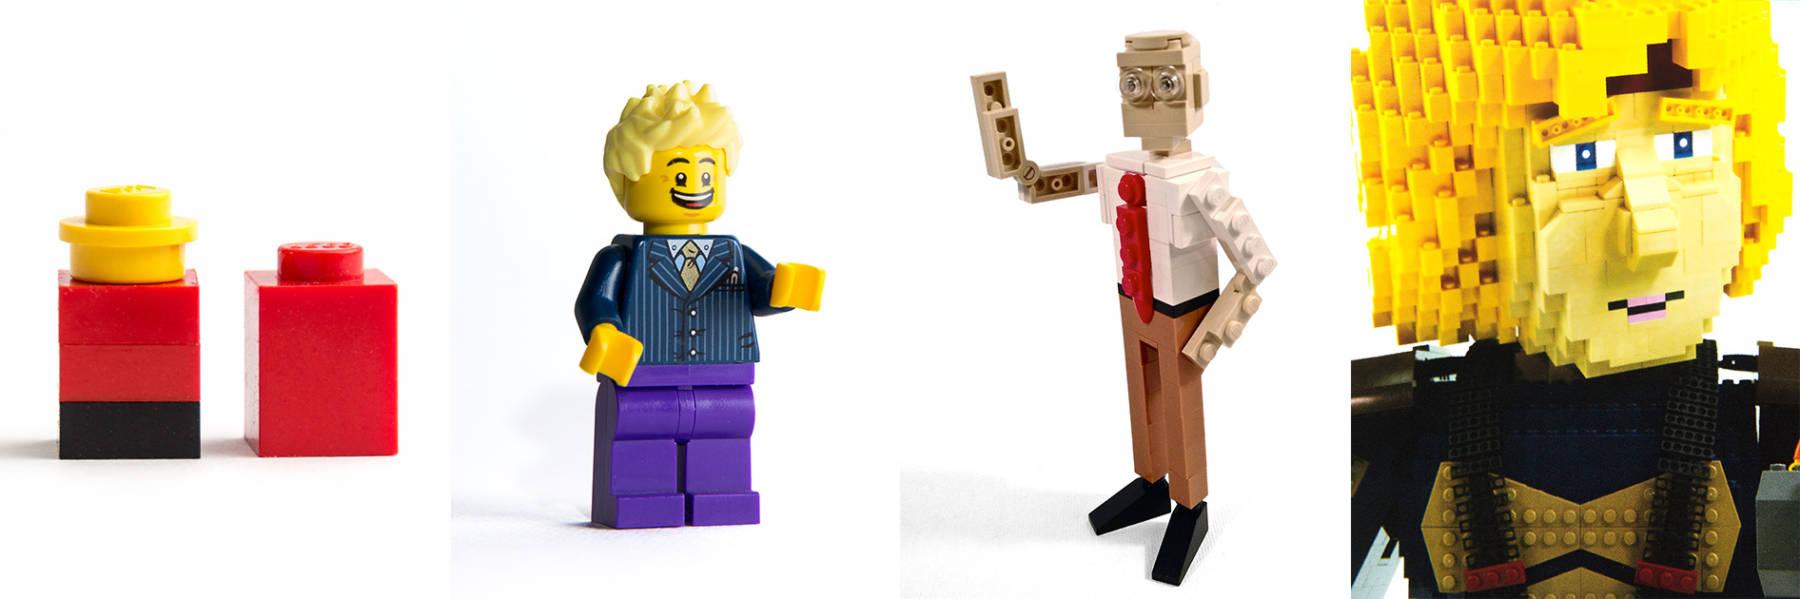 Verschiedene LEGO Figuren Stile